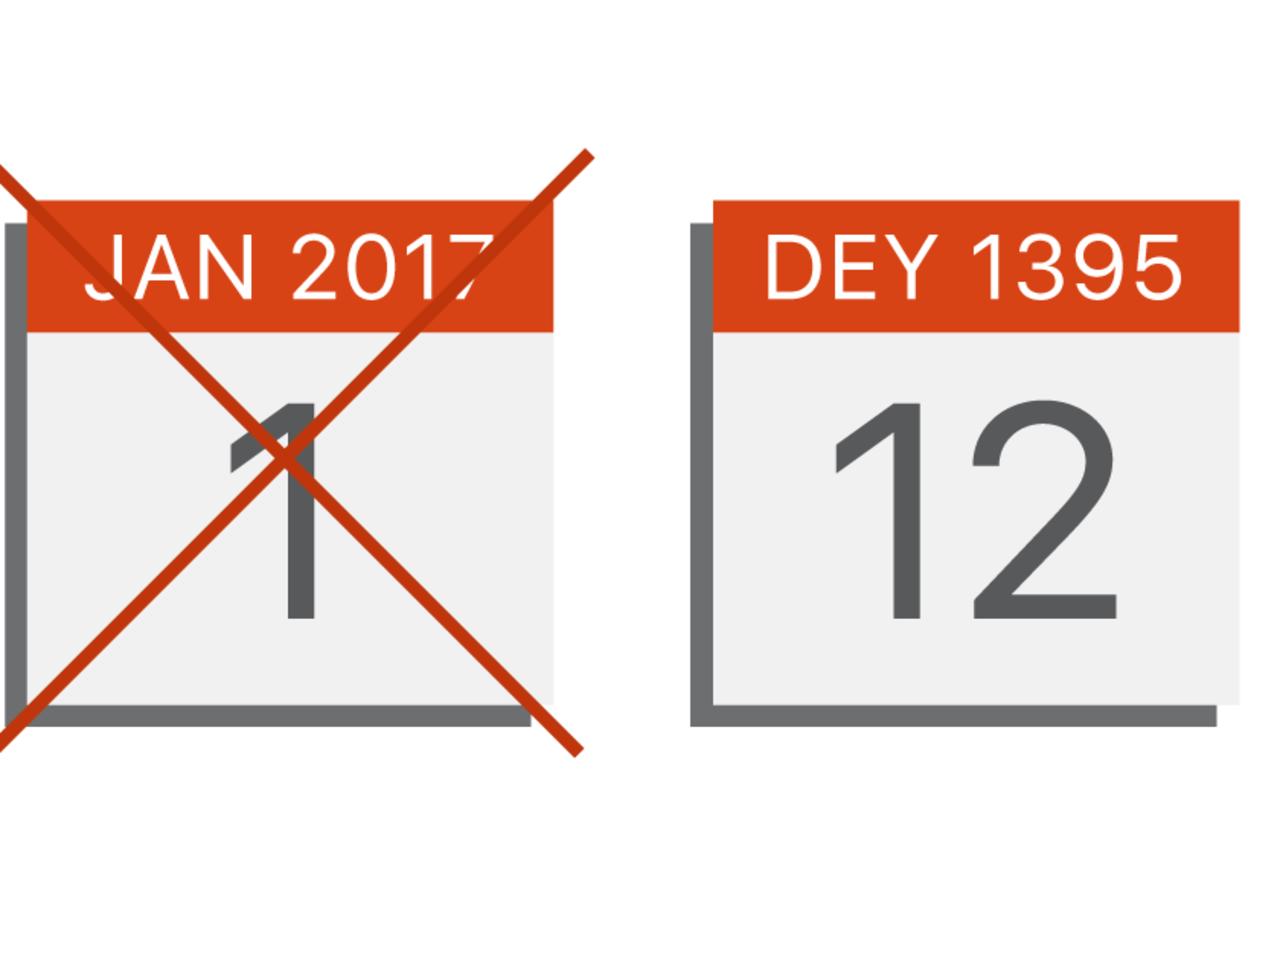 Persian Calendar 2022.Iranian Calendar To Become Global Standard In 2017